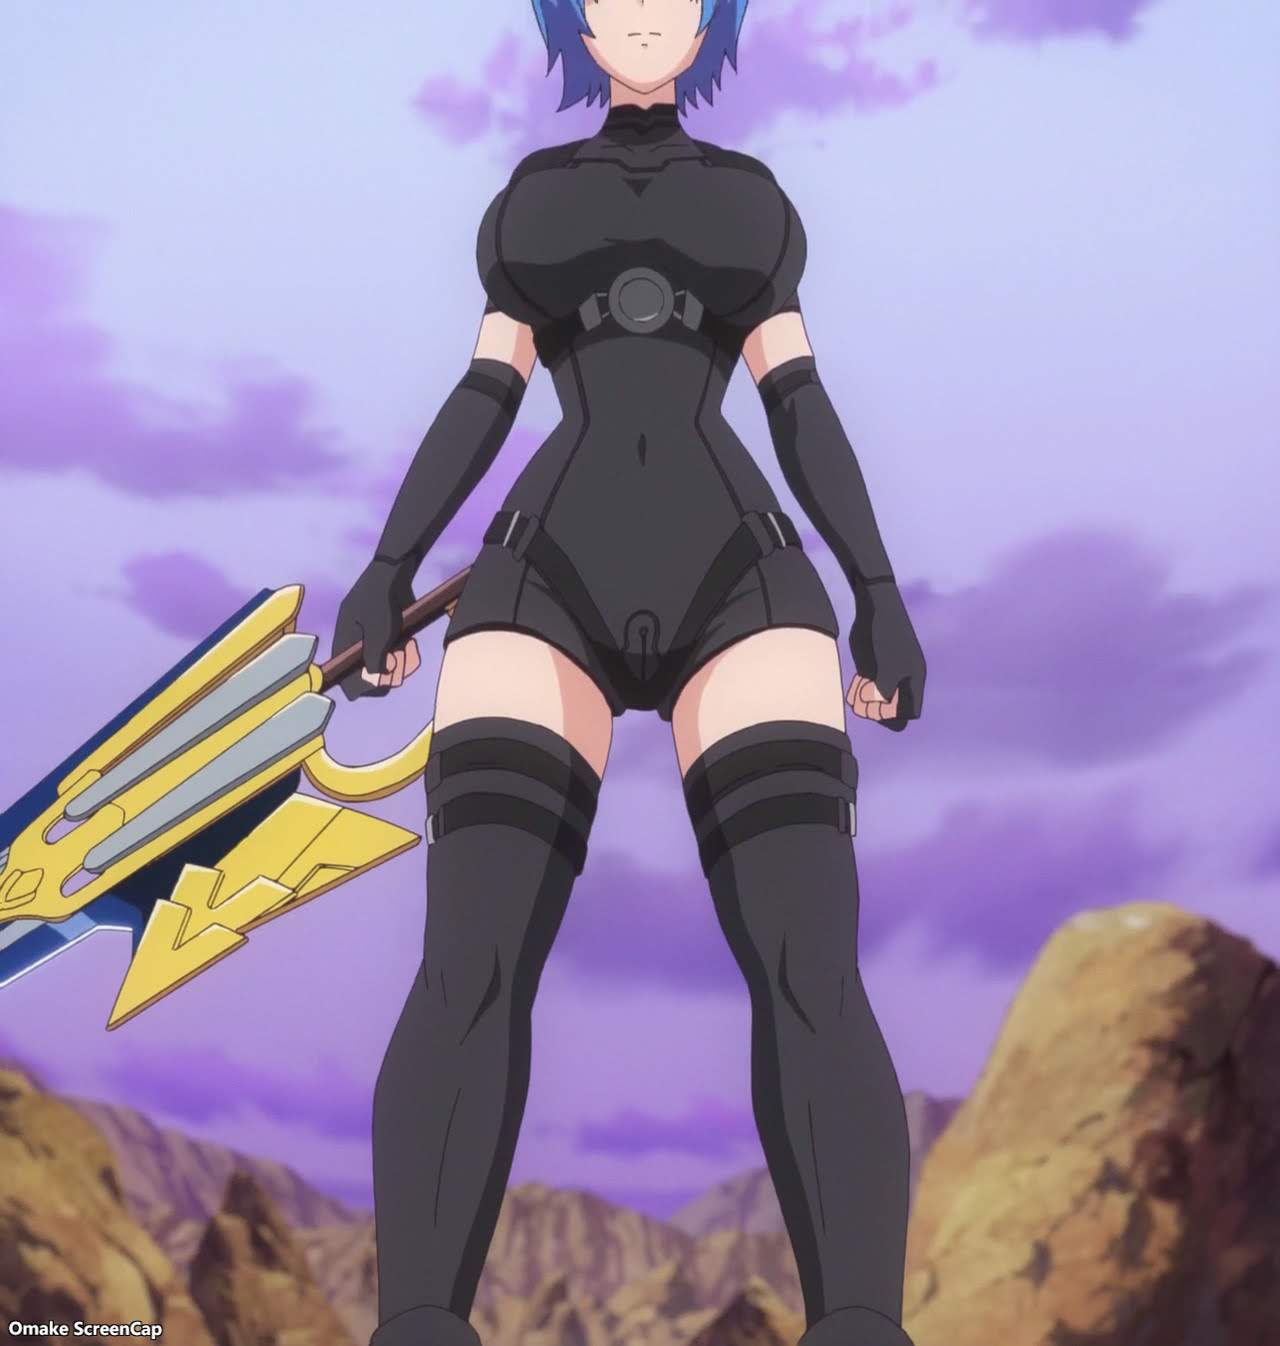 Joeschmos Gears and Grounds: 10 Second Anime - High